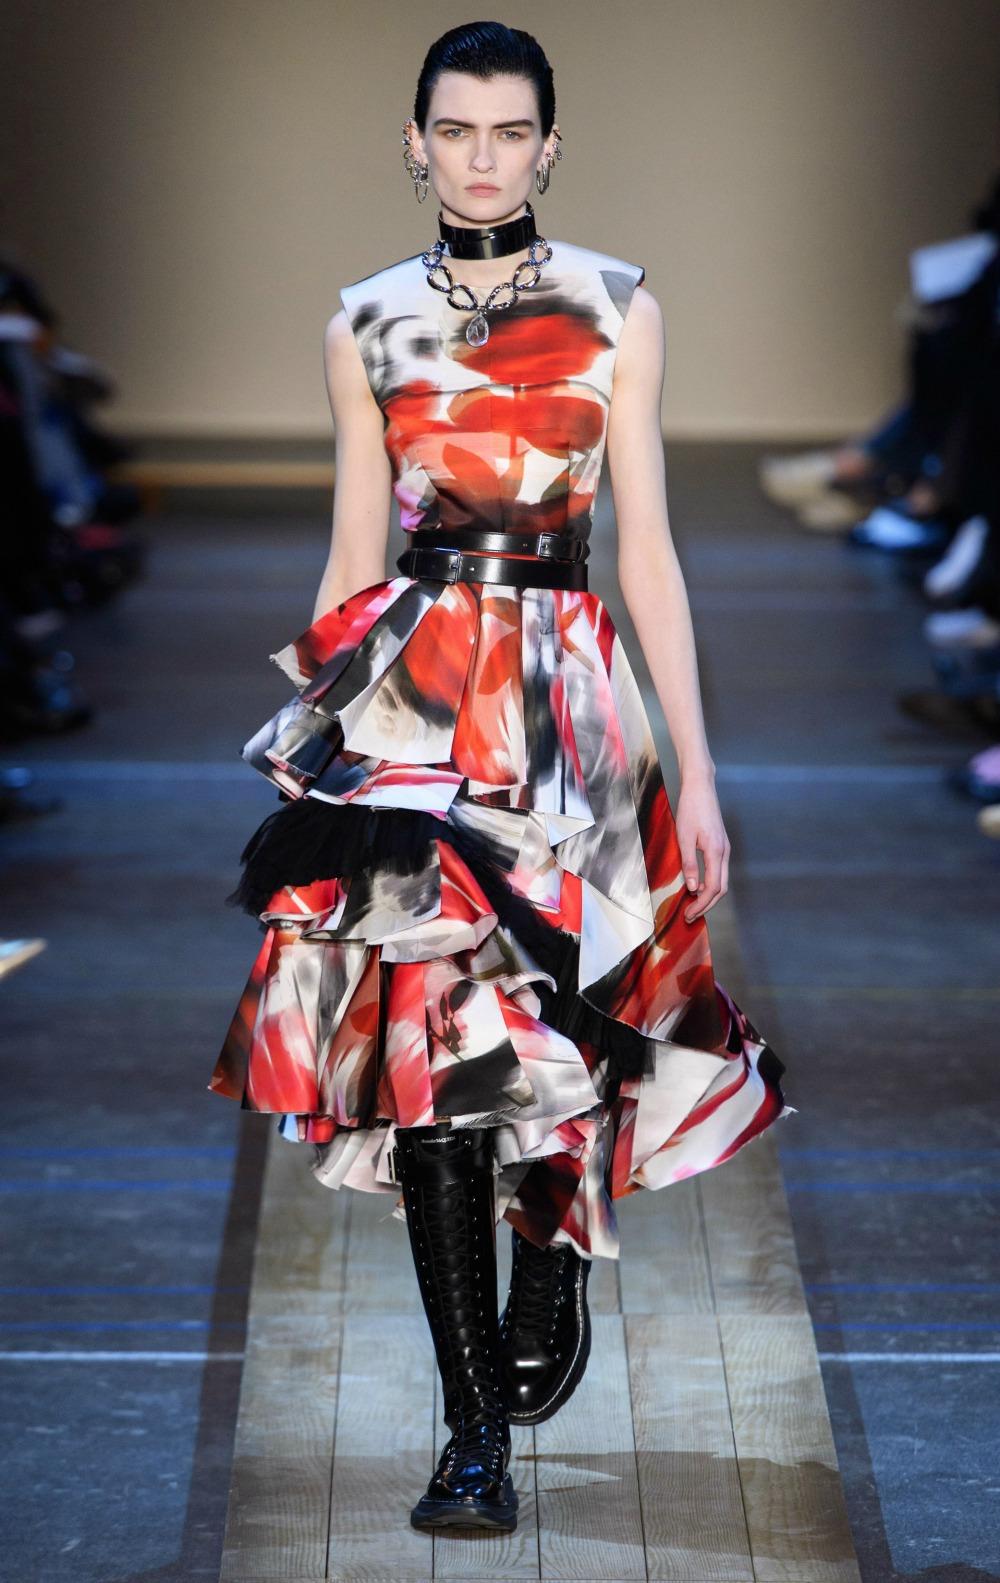 Best Paris Fashion Week Looks - Alexander McQueen Fall 2019 Runway Collection #PFW #FashionWeek